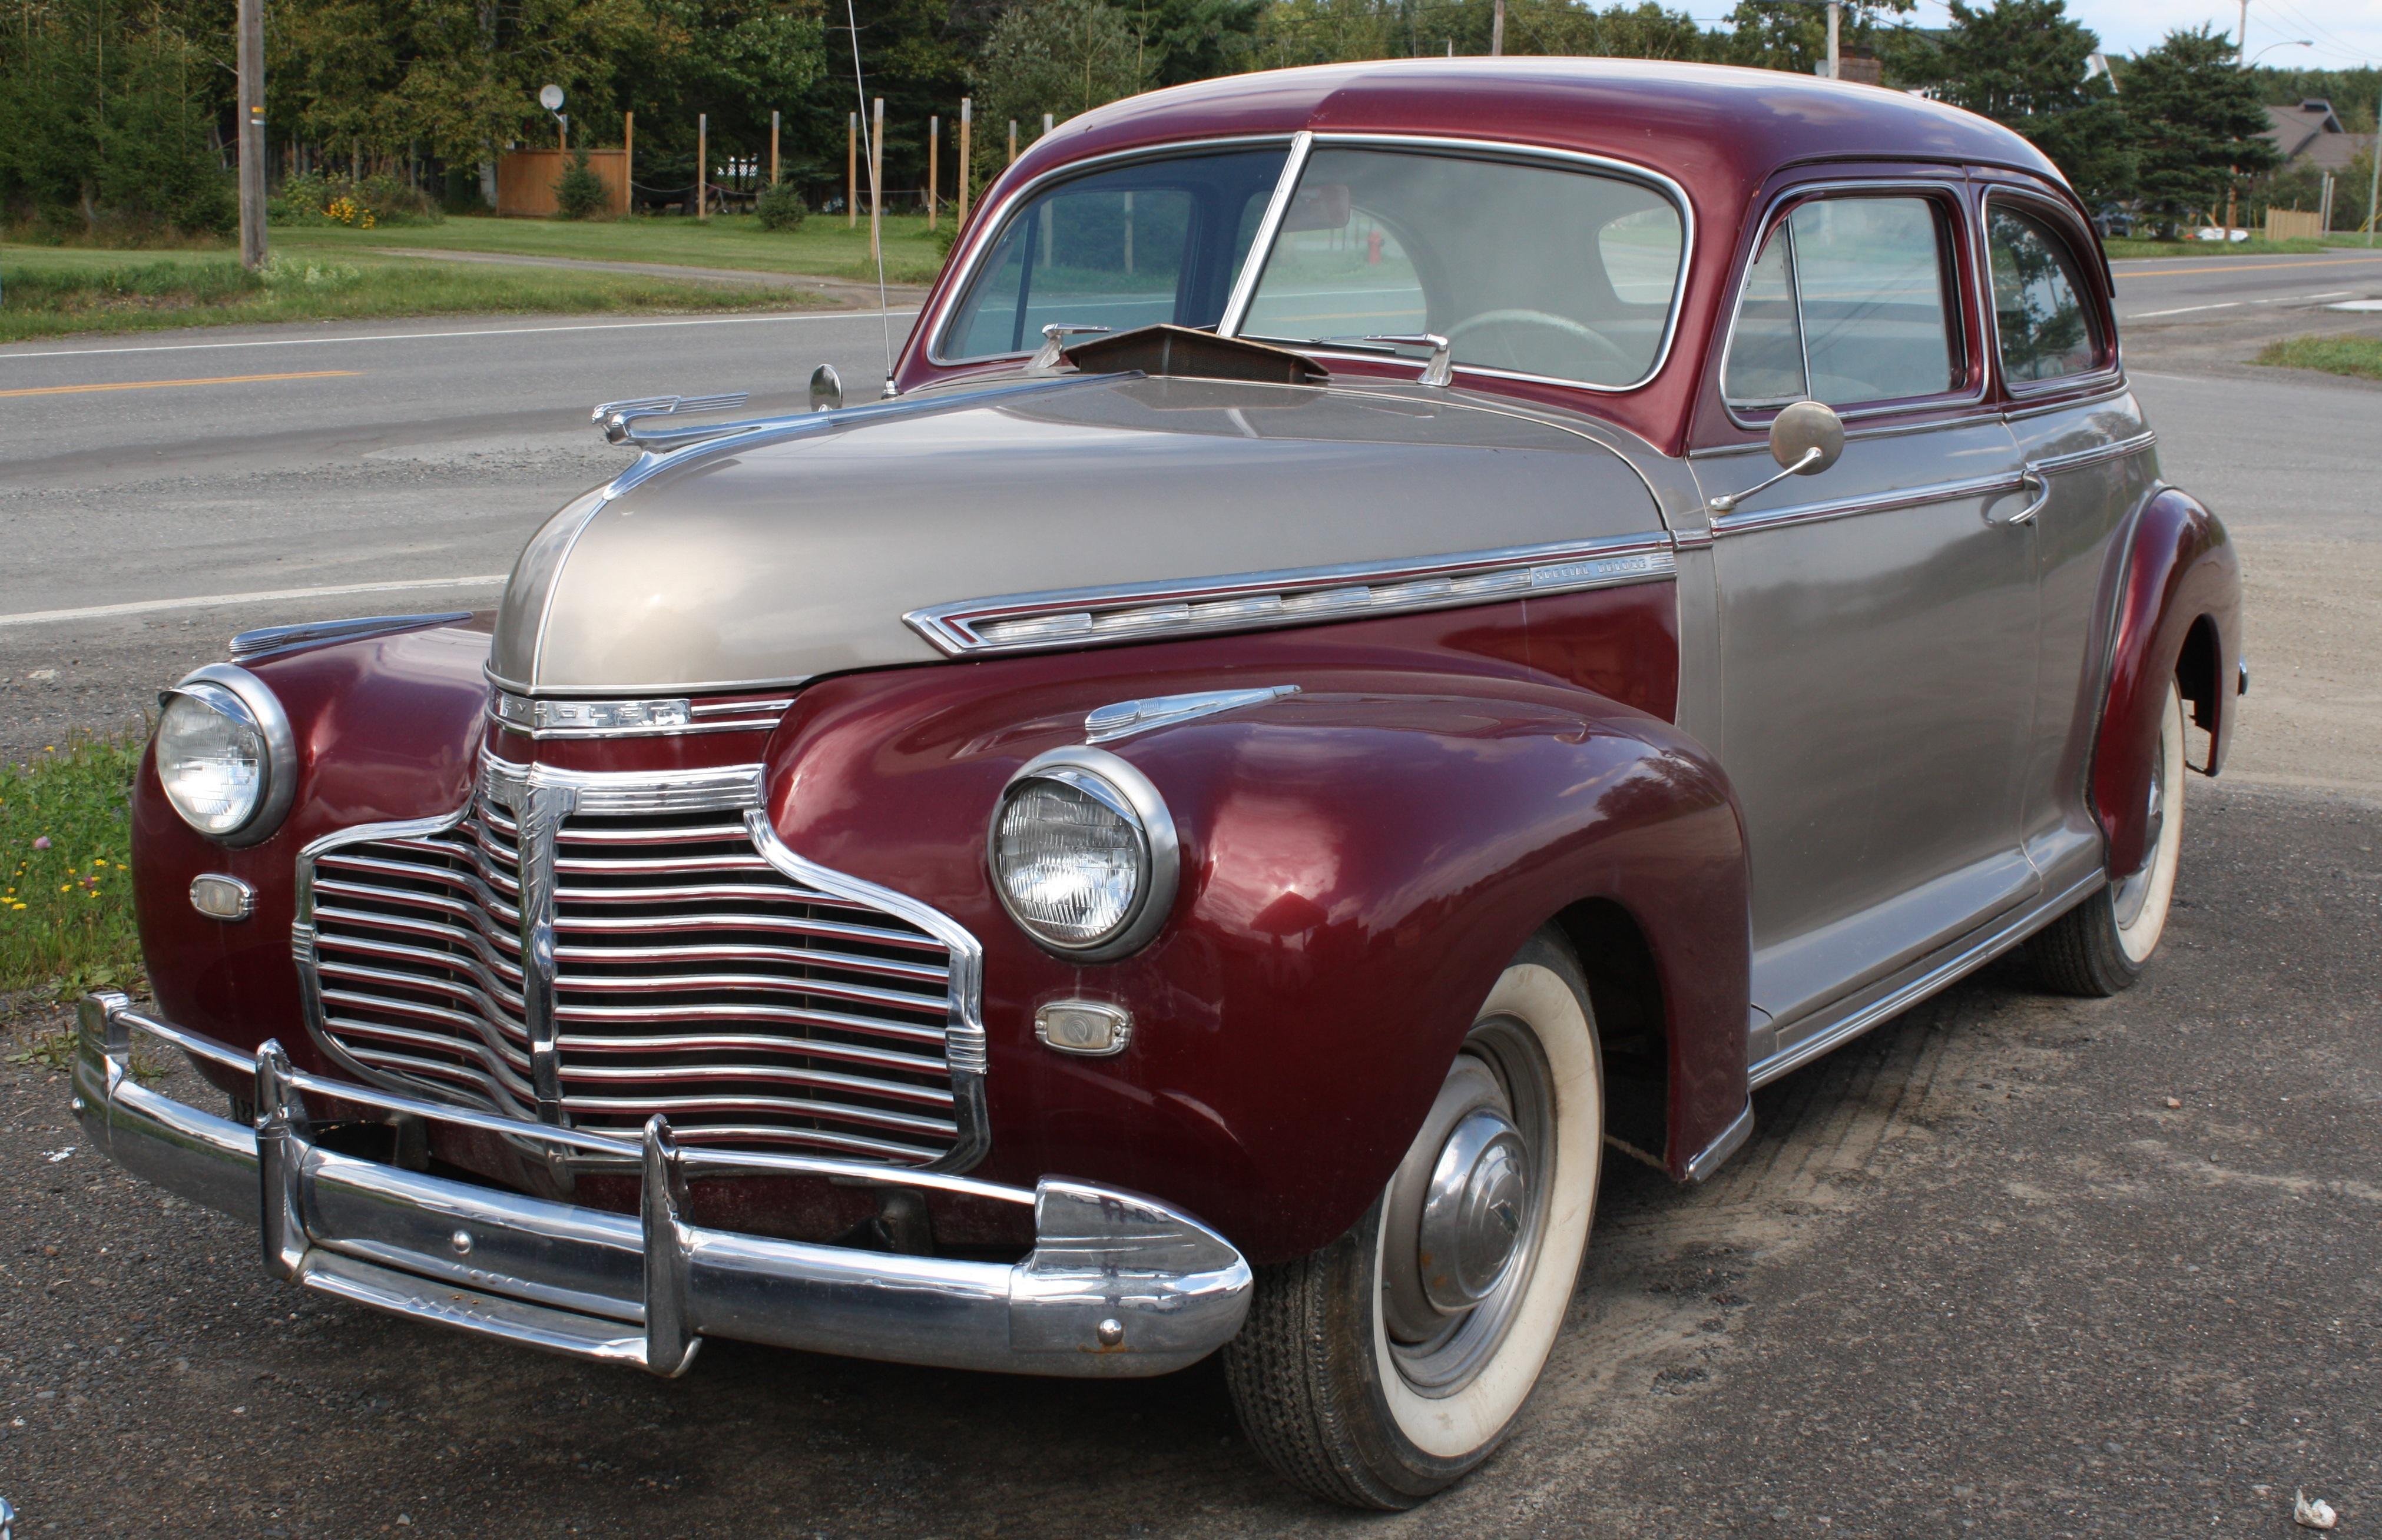 Free Images : red, motor vehicle, vintage car, sedan, old cars ...